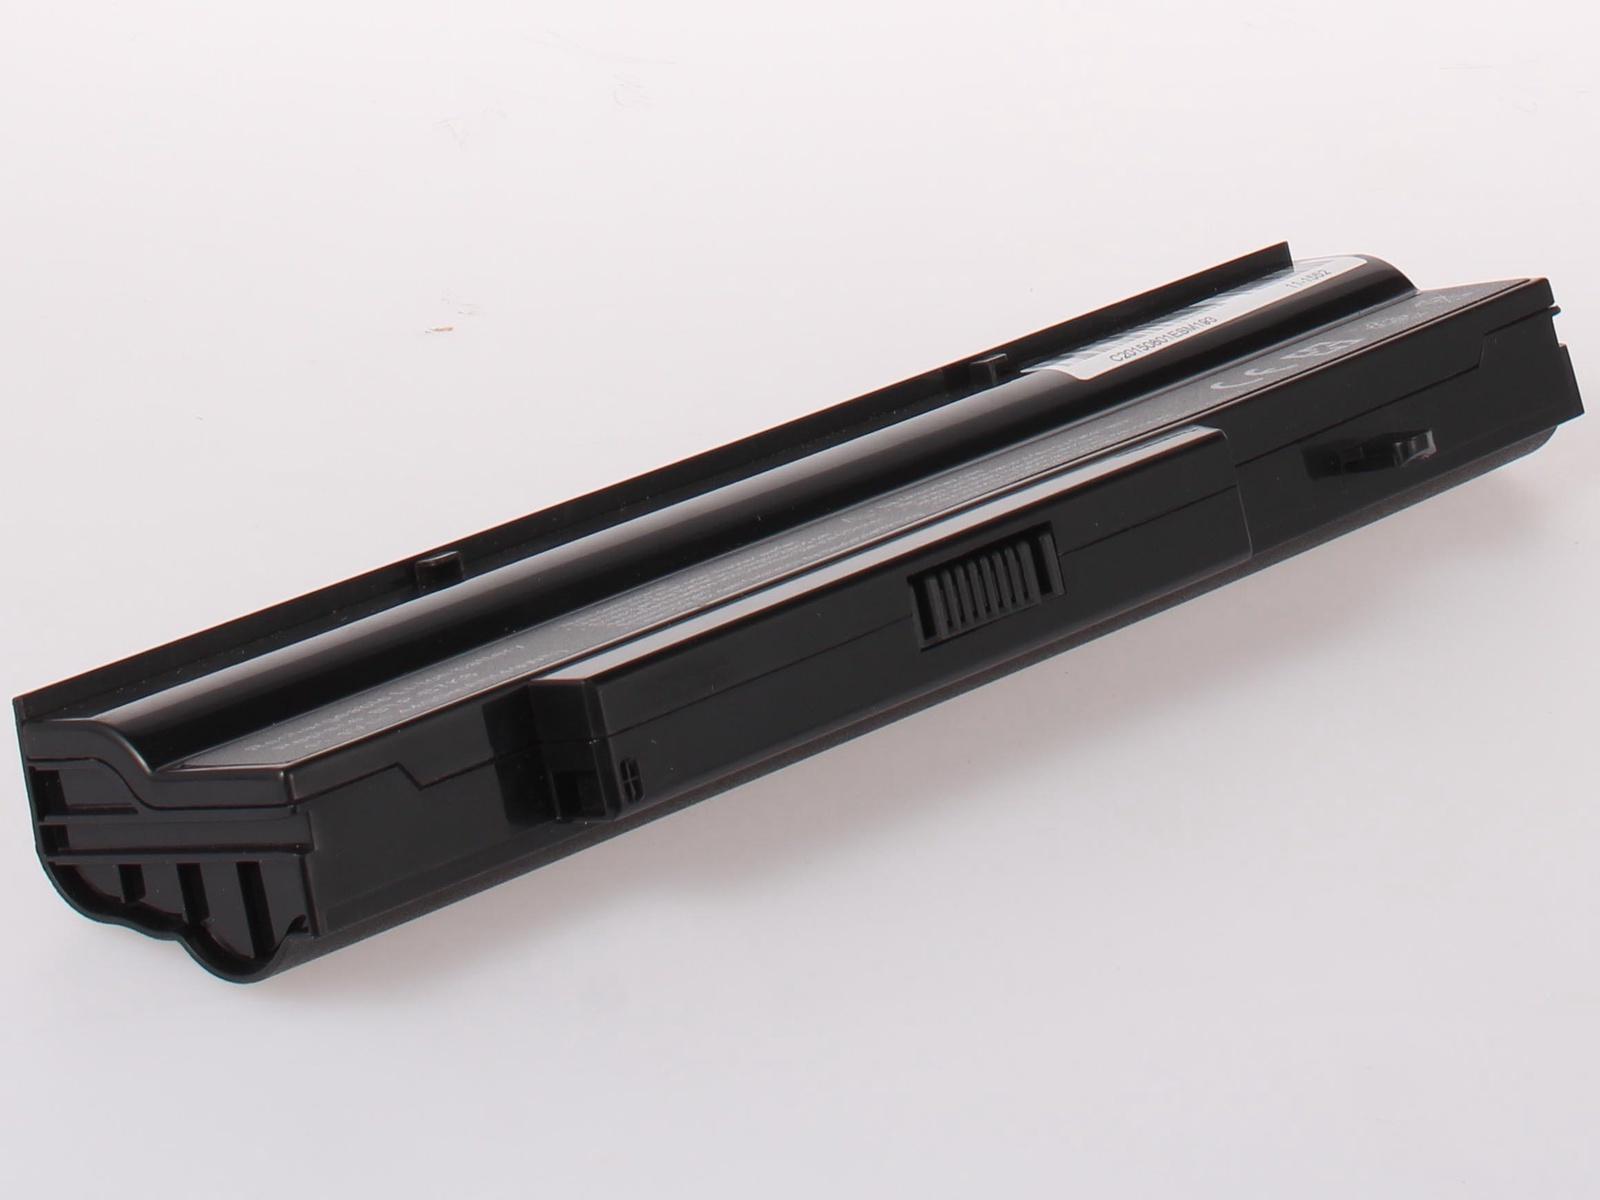 Аккумулятор для ноутбука AnyBatt для Fujitsu-Siemens Amilo Pro V3505, Esprimo V5545, Amilo Pro V3405, Esprimo Mobile V5545, Amilo Li 2727, Esprimo V5505, Esprimo Mobile V5505, Esprimo V6535, Amilo Pro V3525, Esprimo V6505